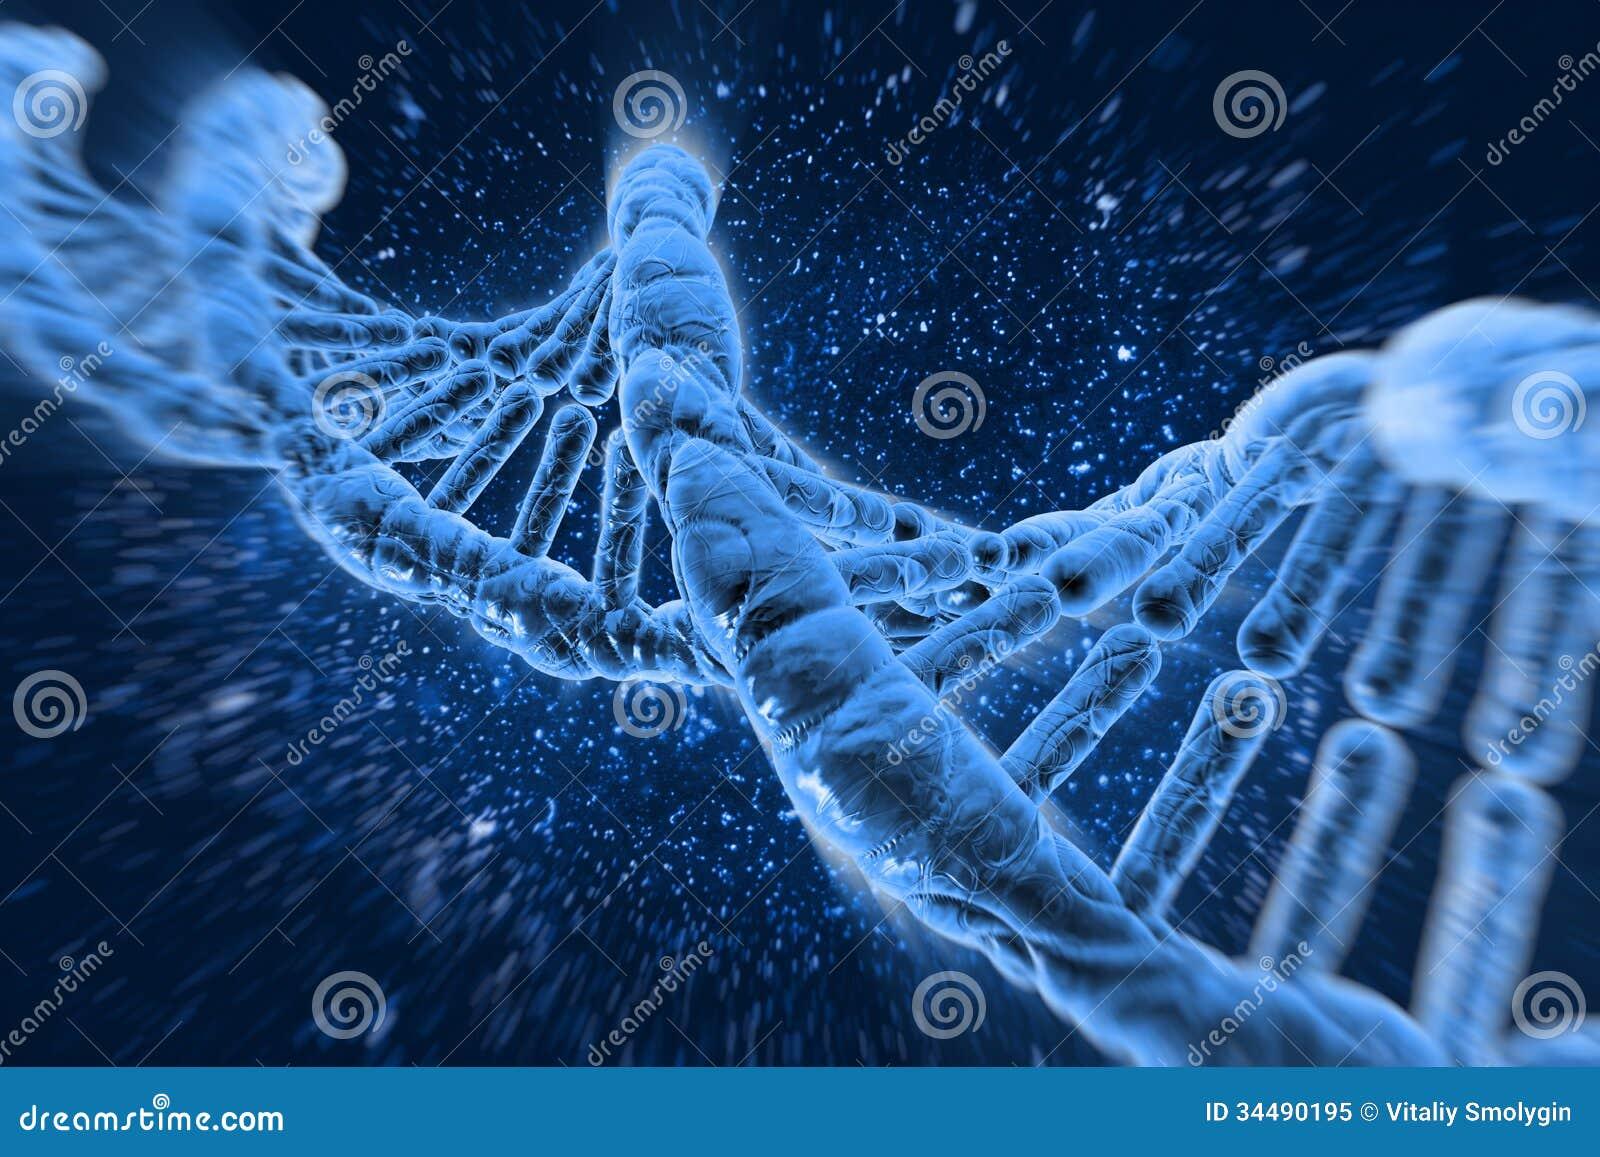 Dna molecules royalty free stock photo image 34490195